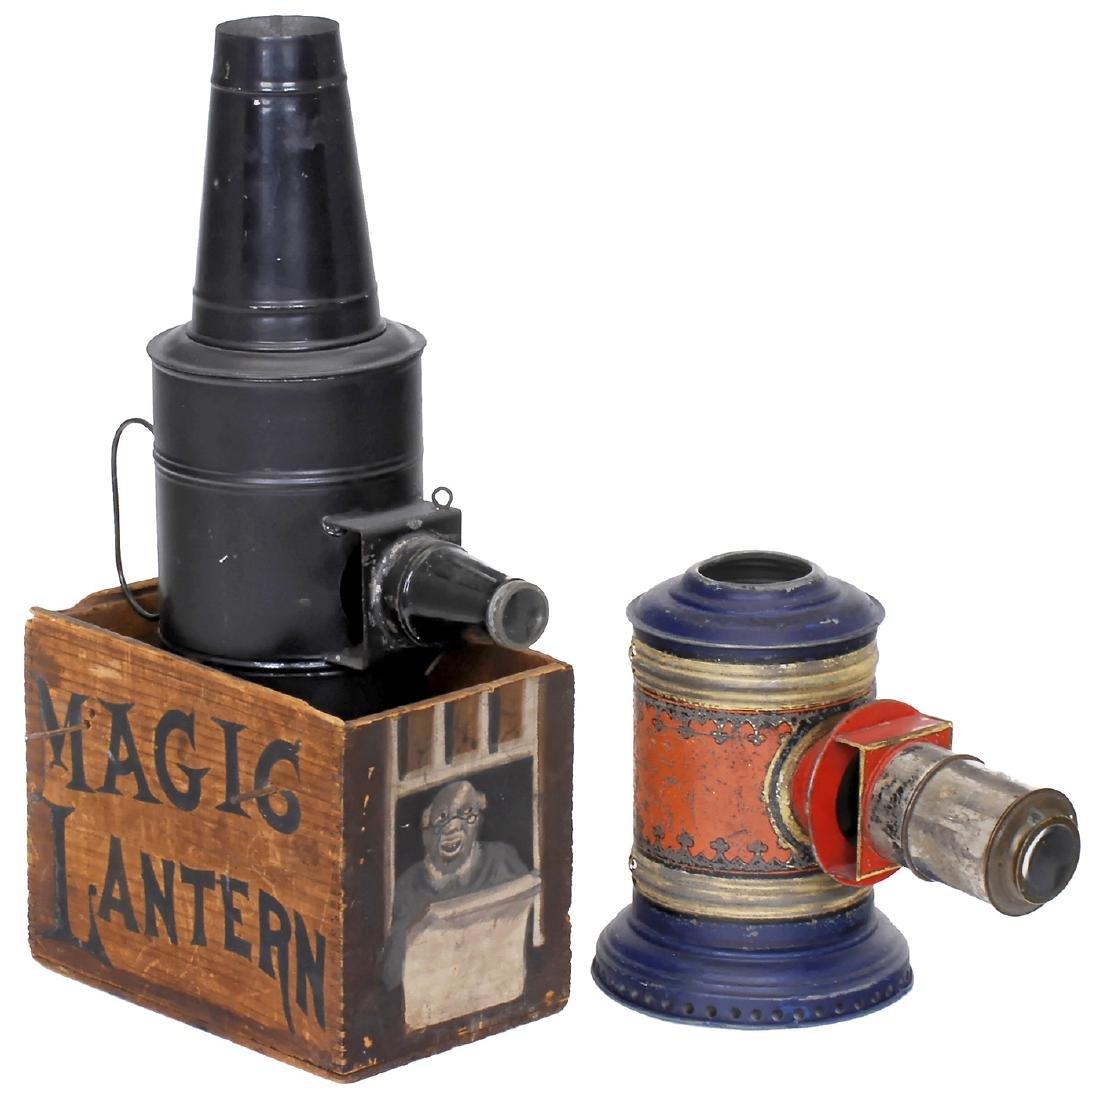 2 Magic Lanterns by Plank and Mason